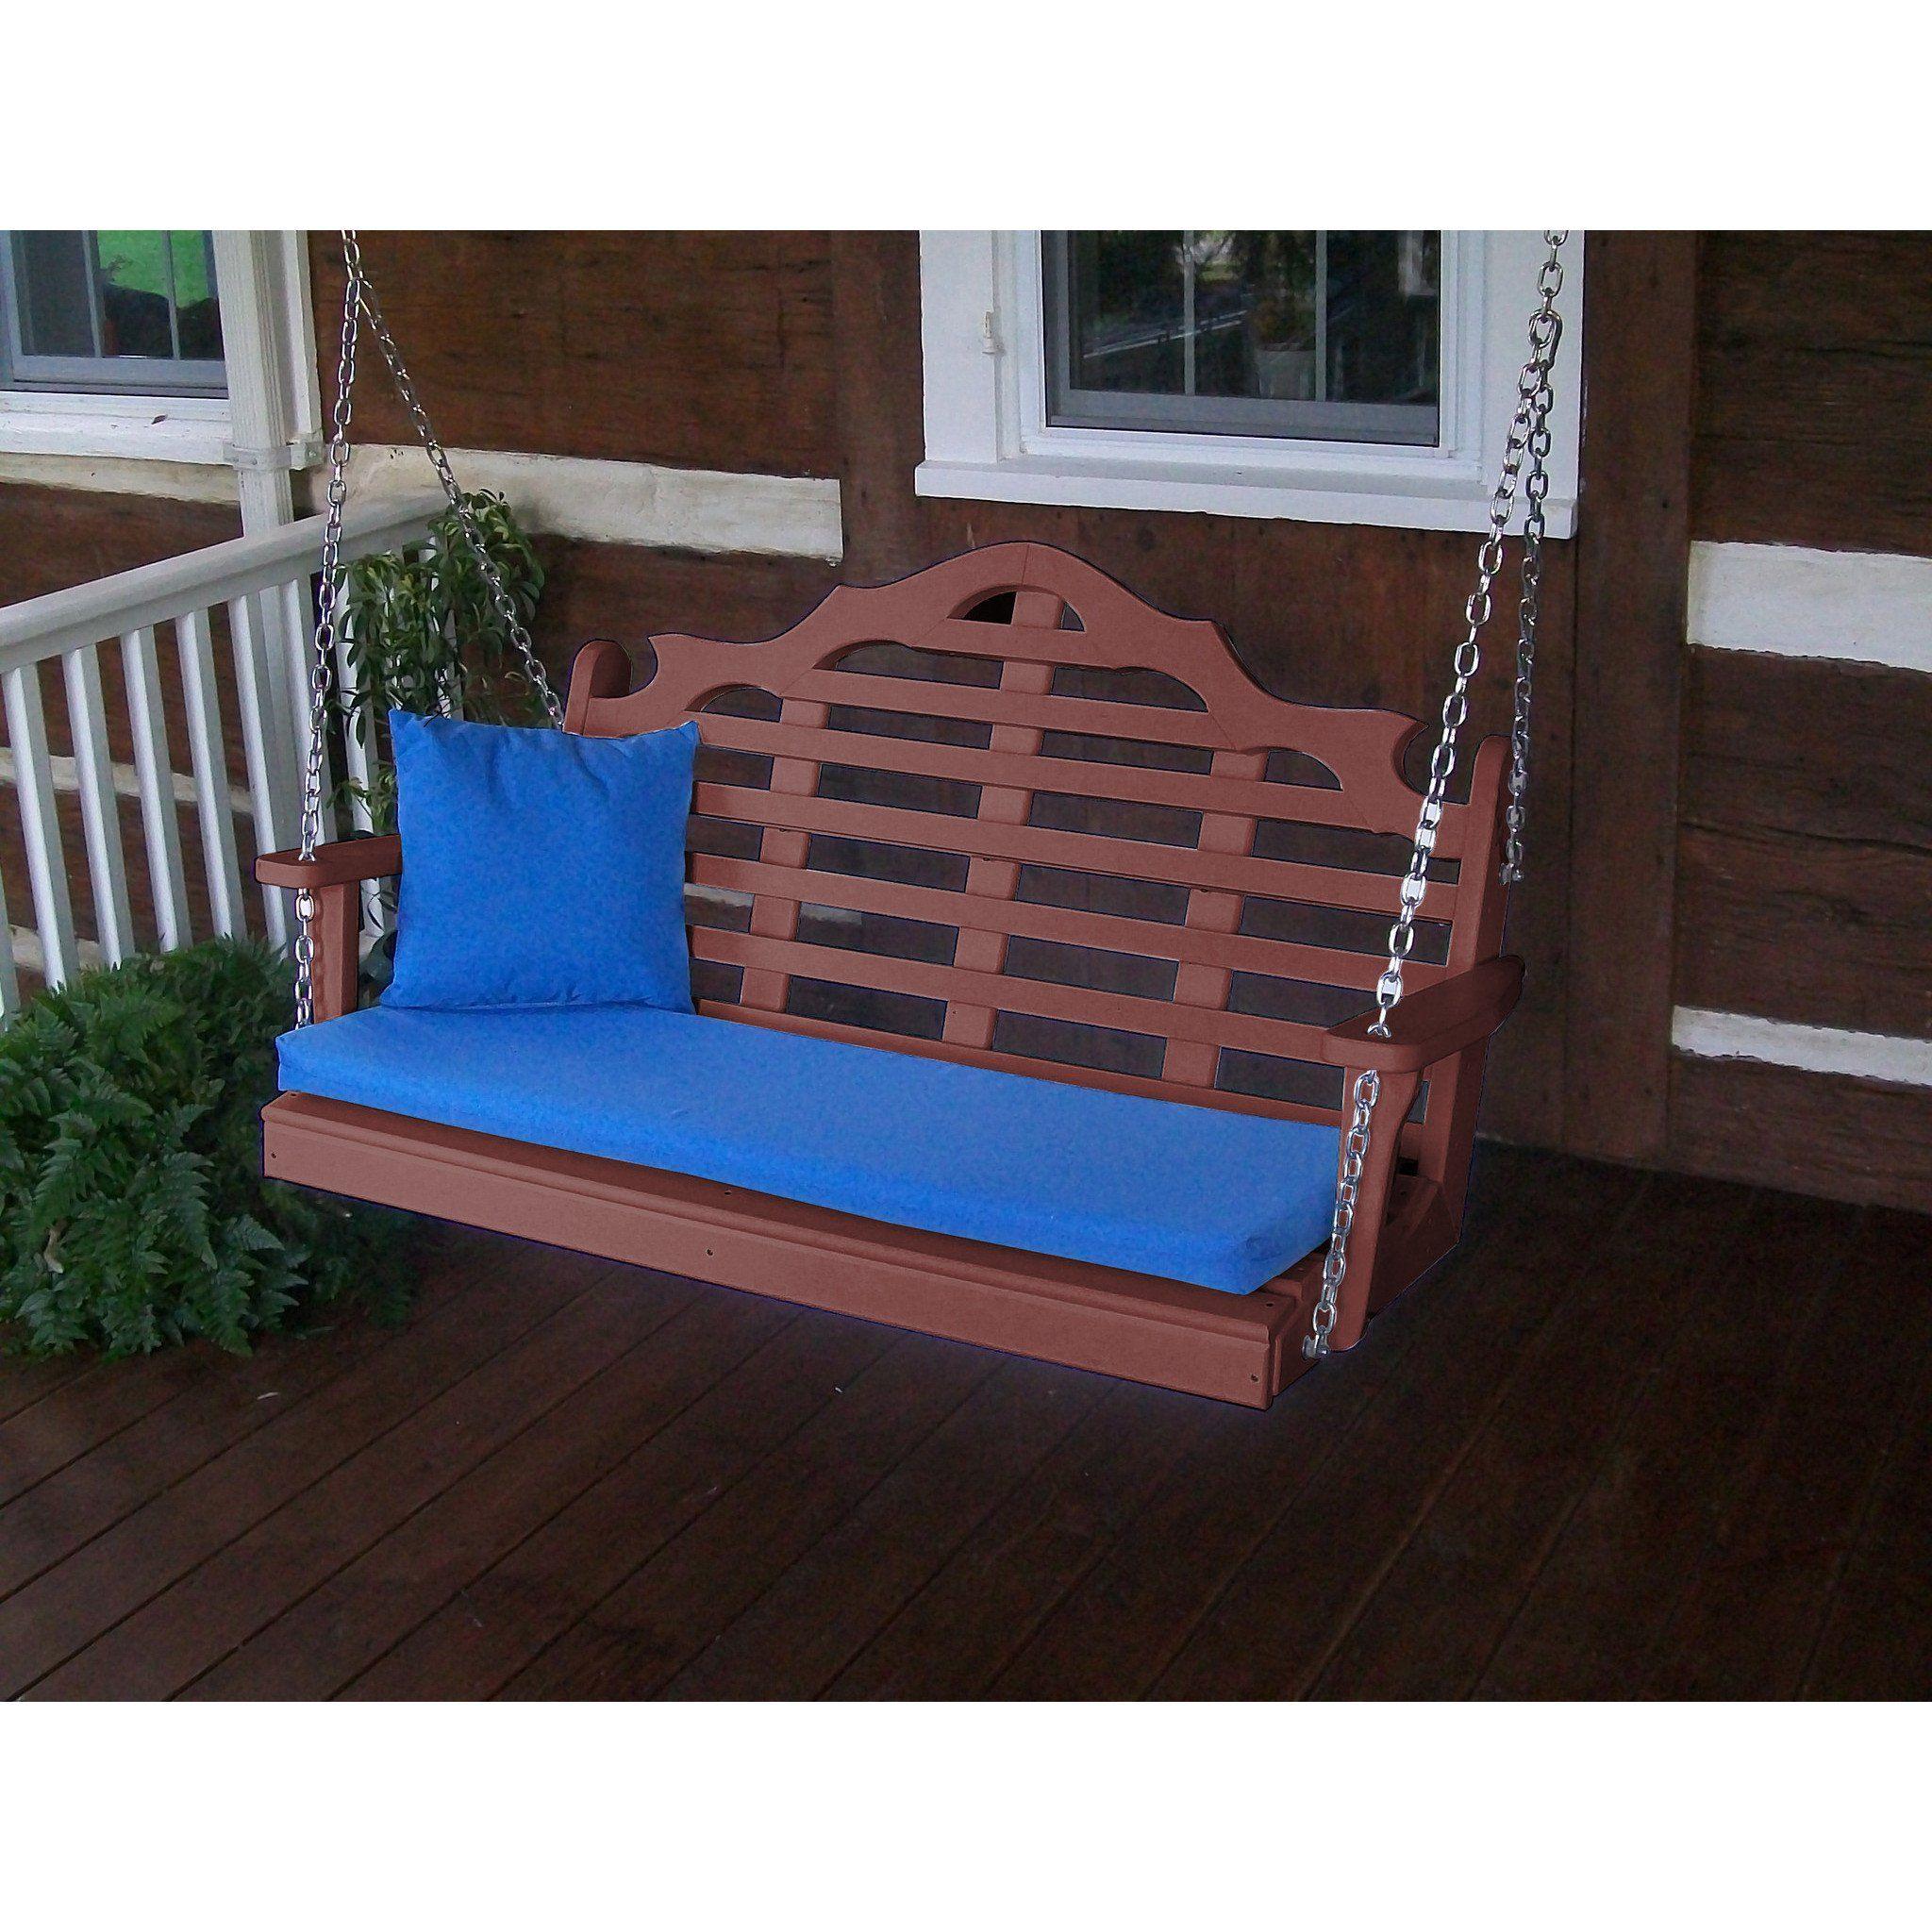 A Amp L Furniture Company Marlboro Recycled Plastic 5ft Porch